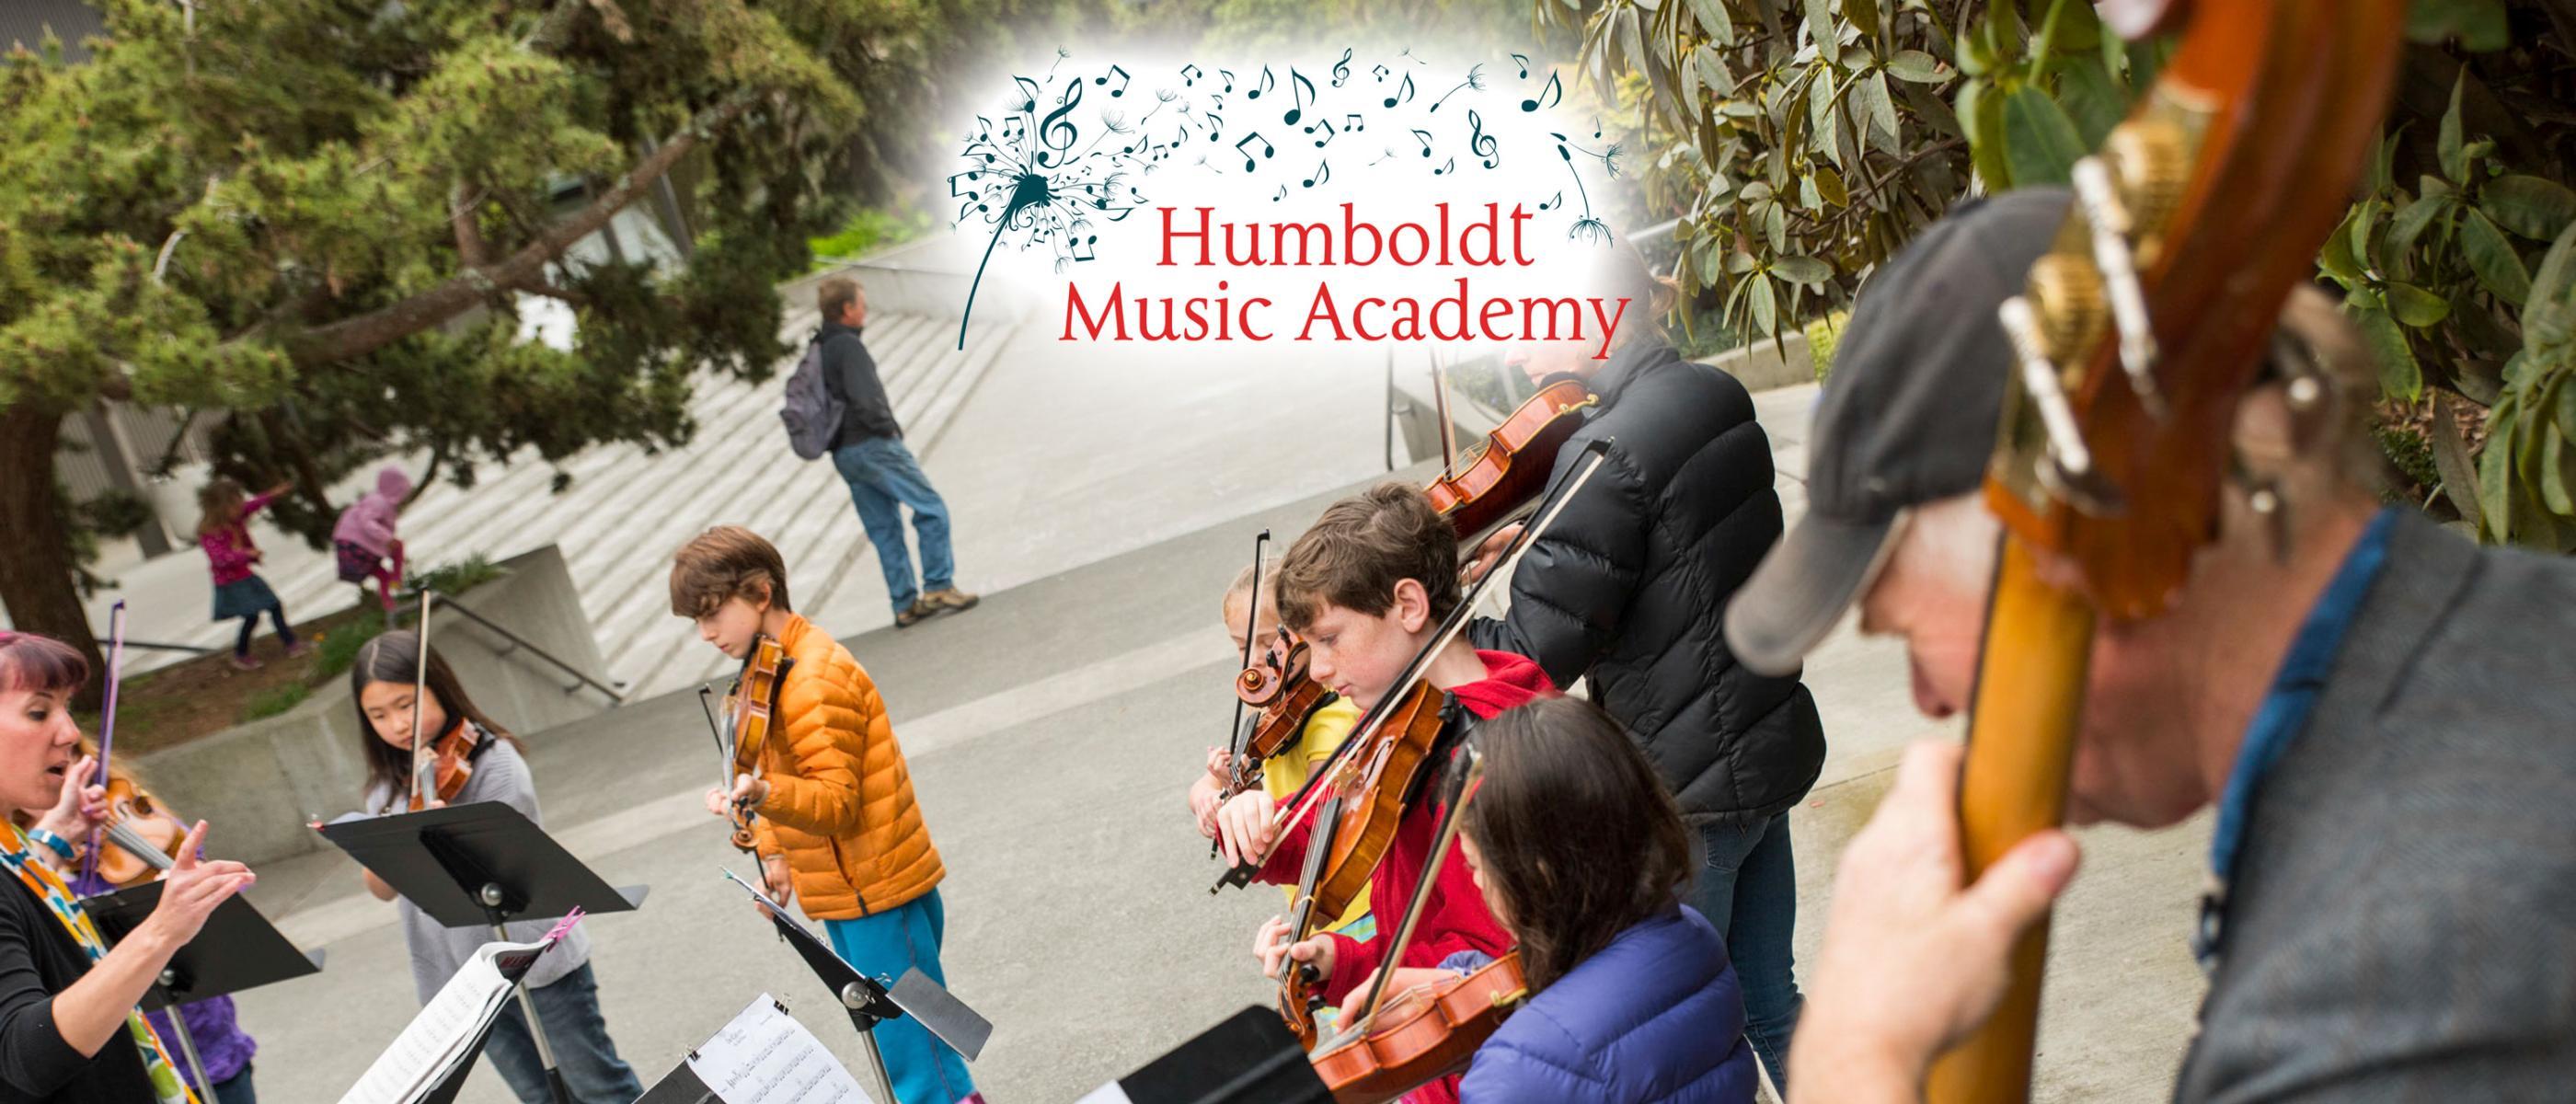 Humboldt Music Academy